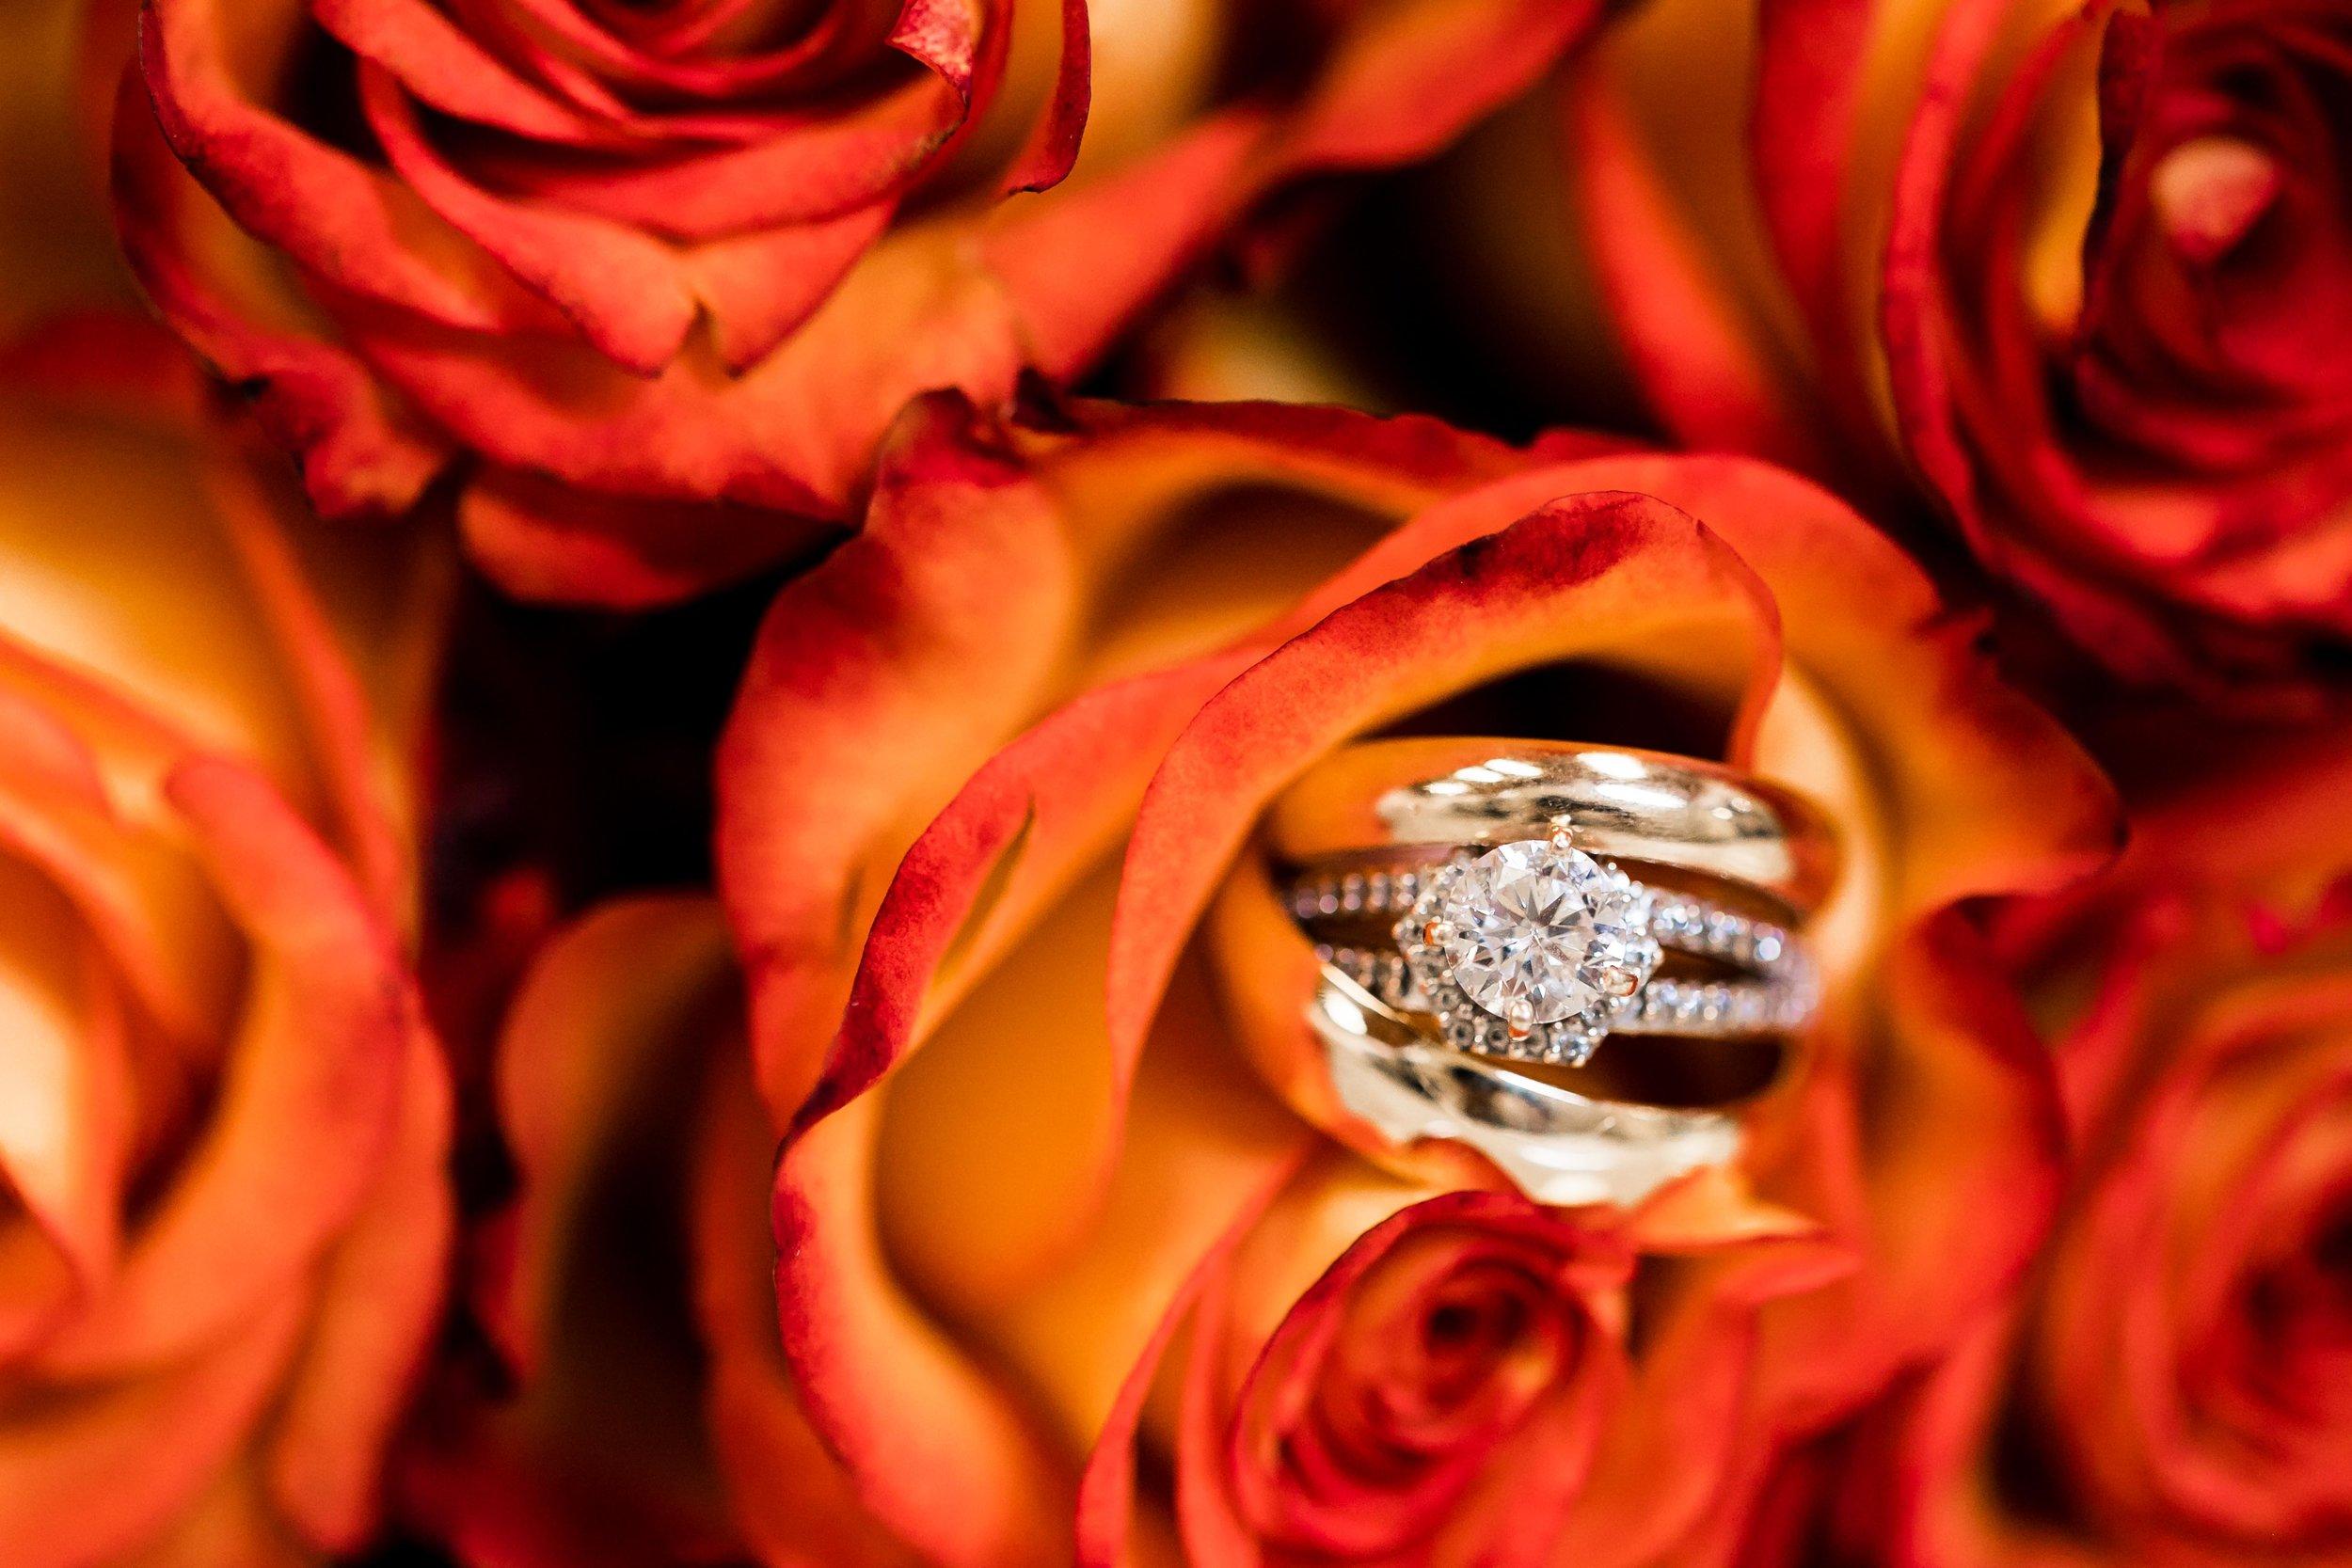 southern_california_wedding_joshuachun_photography_portraits-3.JPG